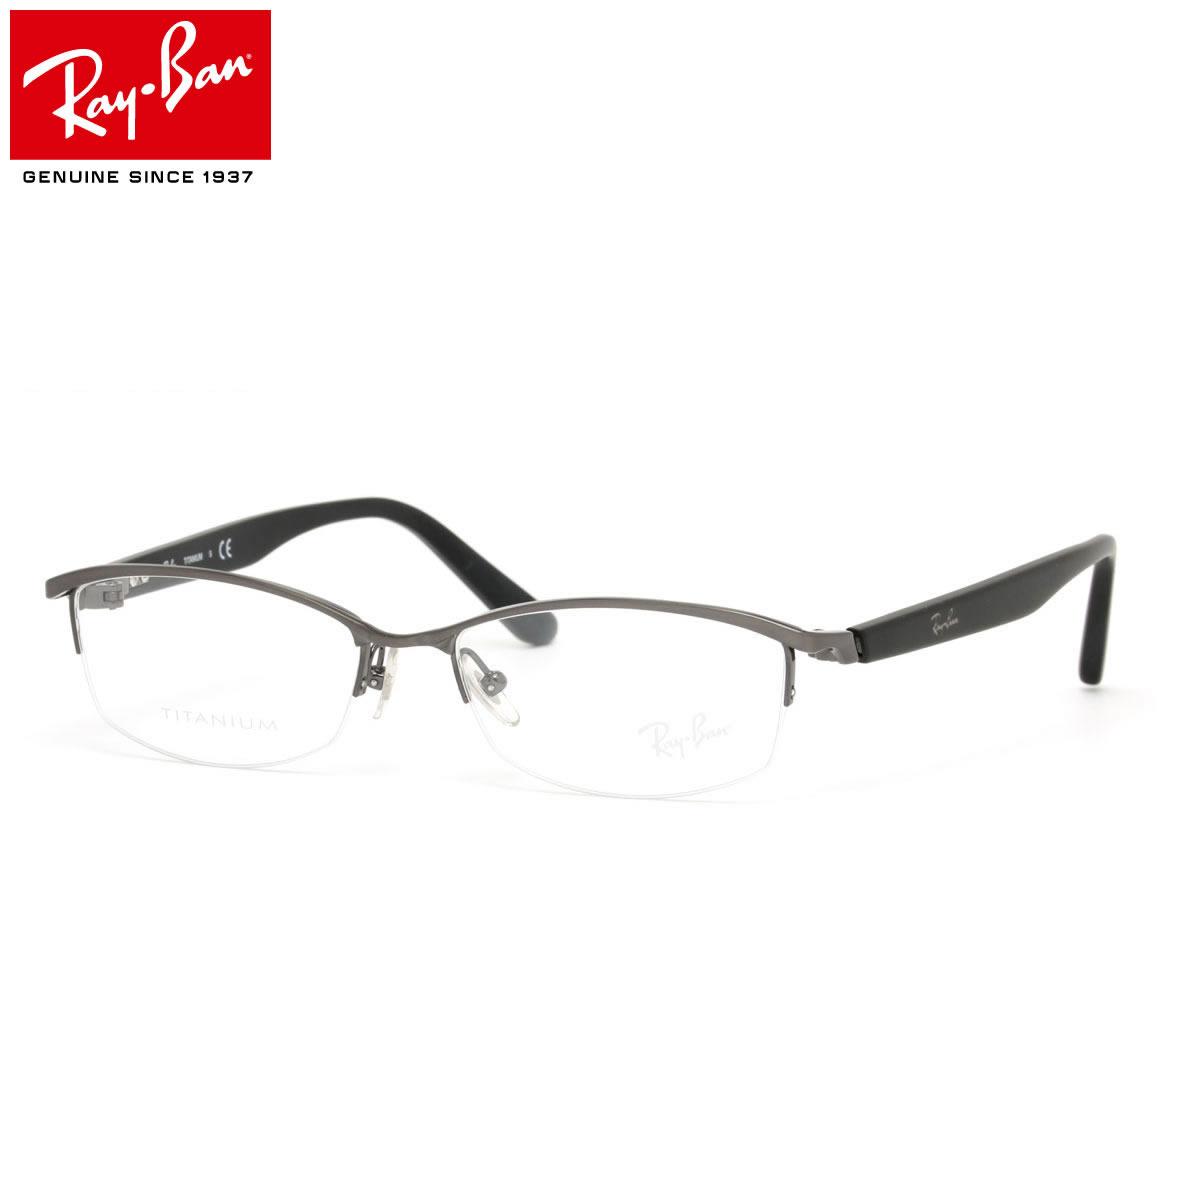 ray ban sunglasses womens 55